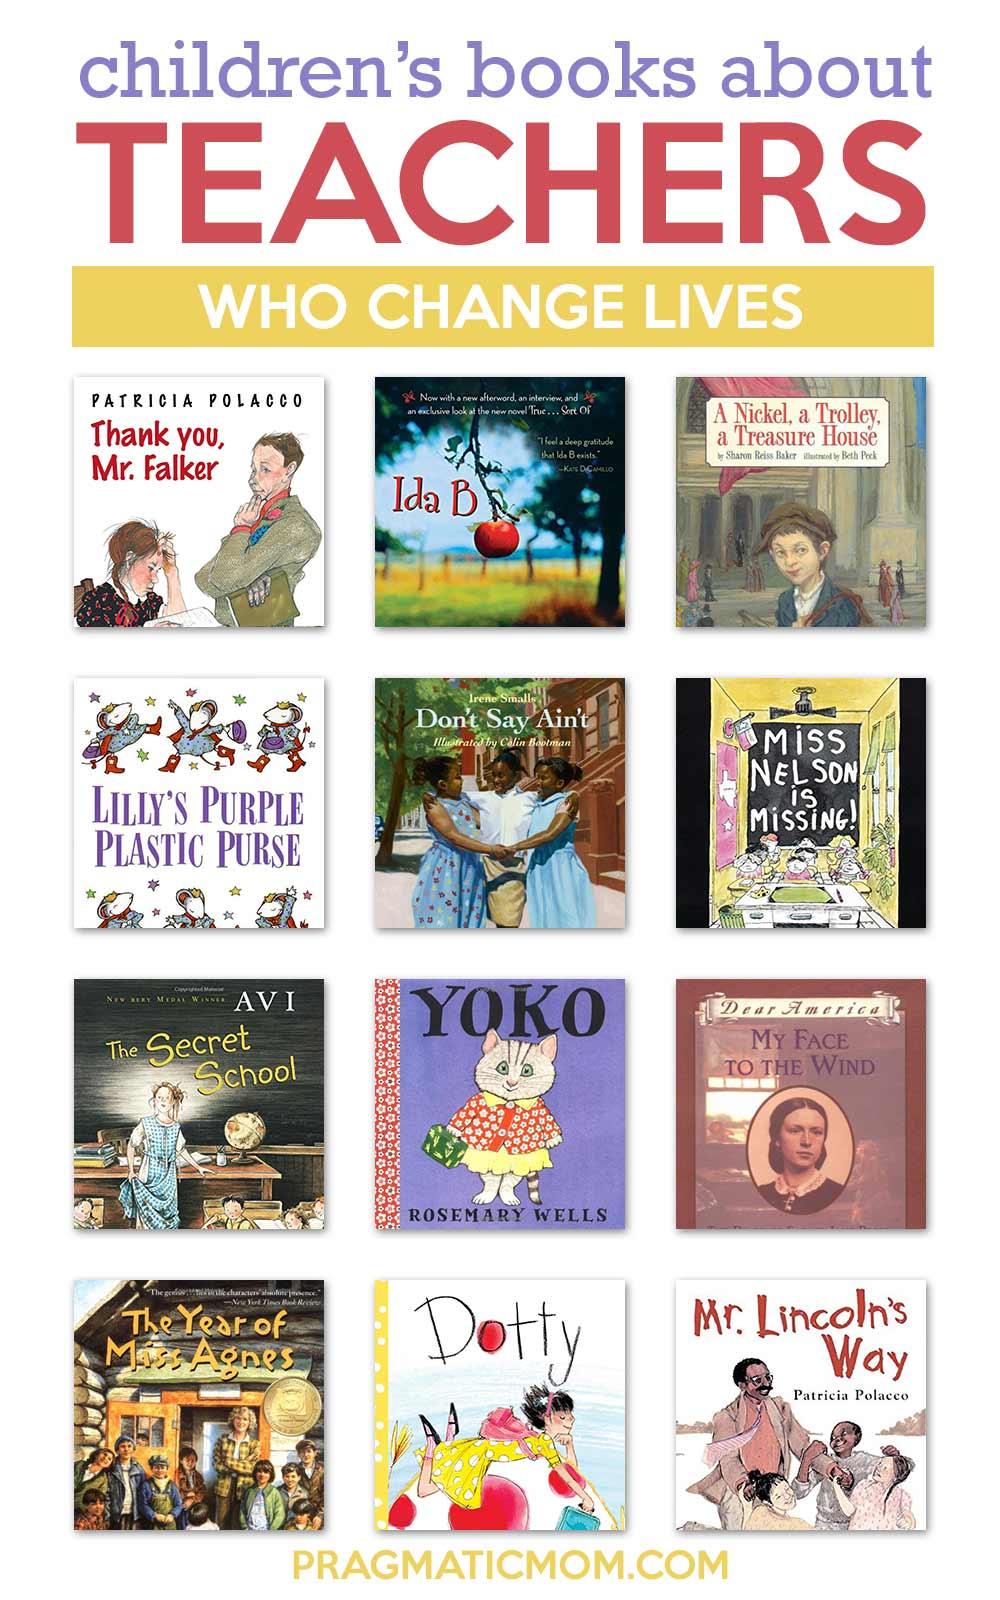 Children's books about teachers